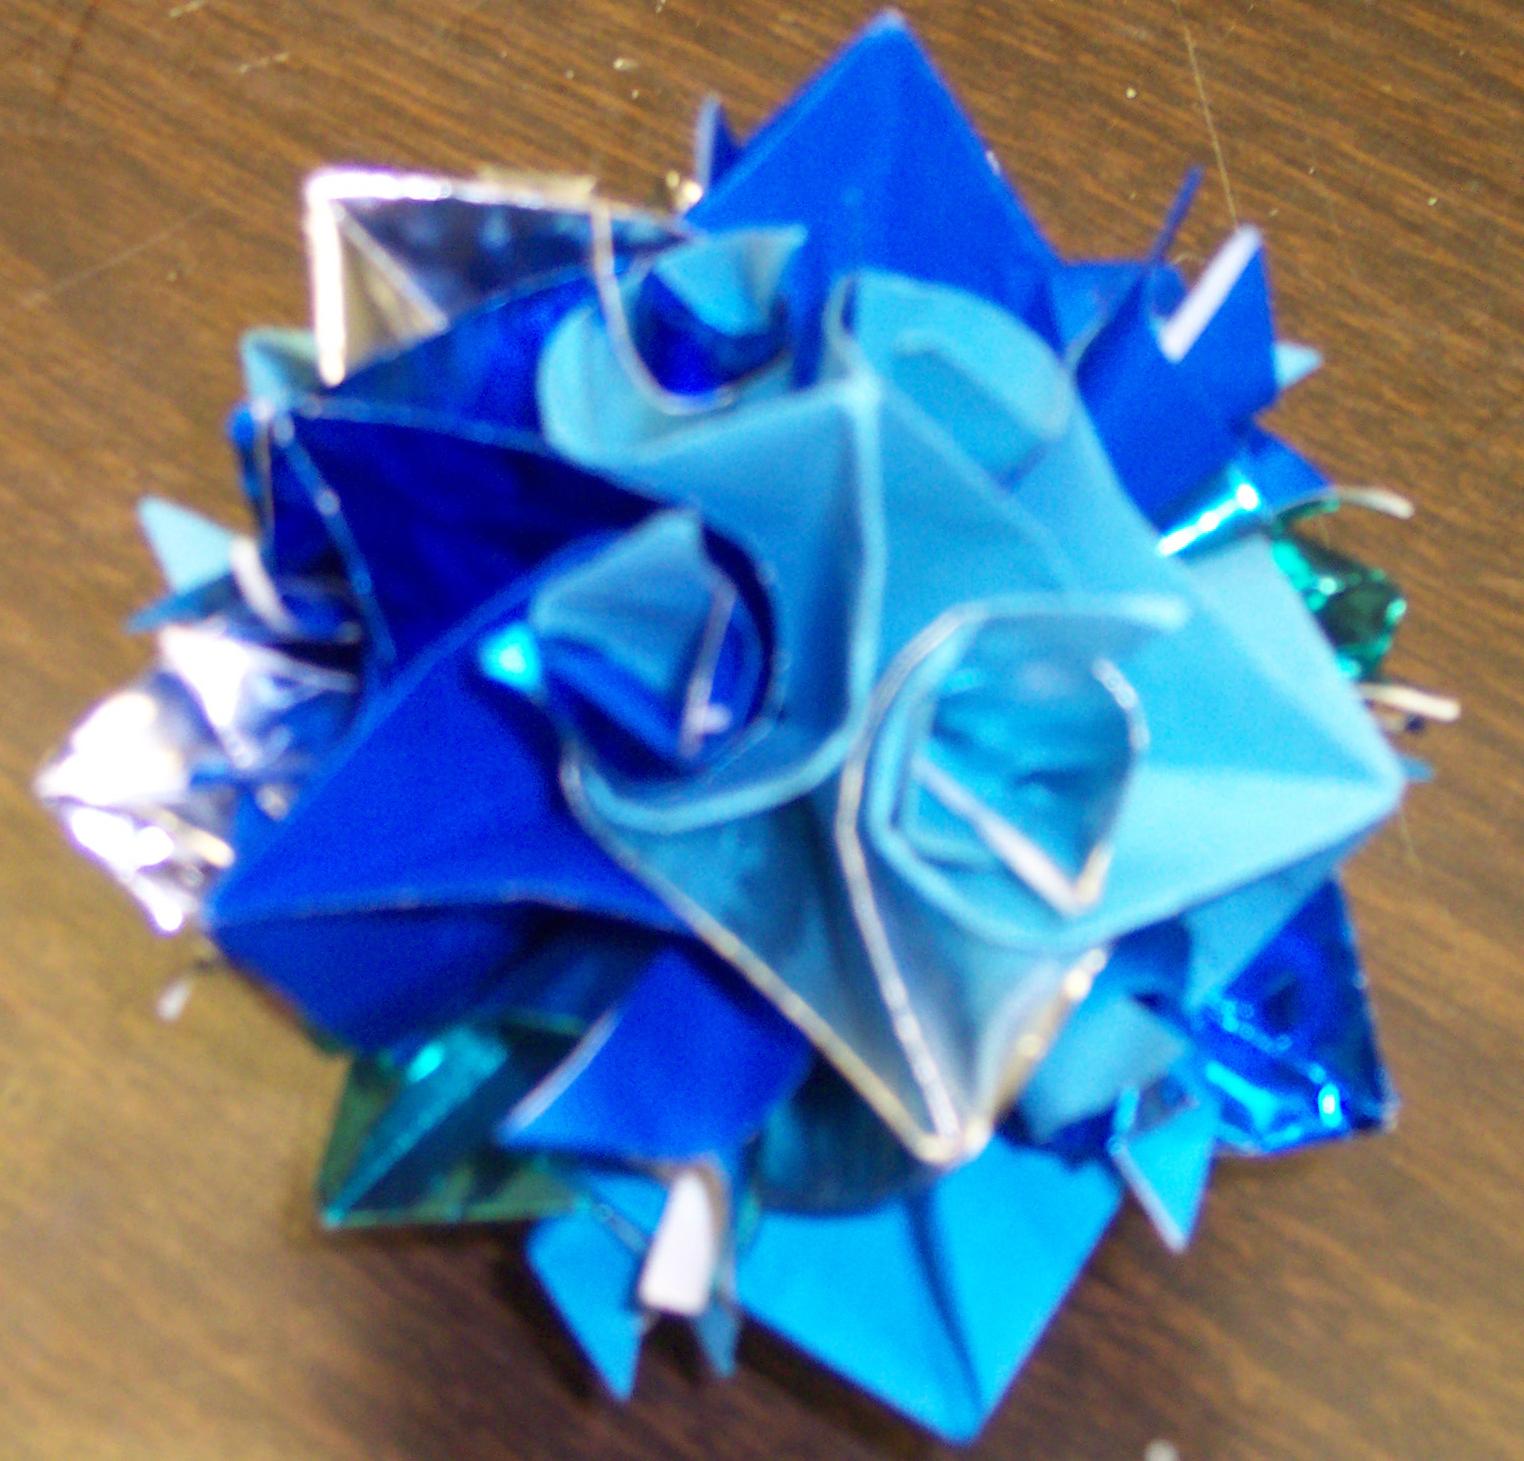 Origami Modular Origami Kirigami Welcome